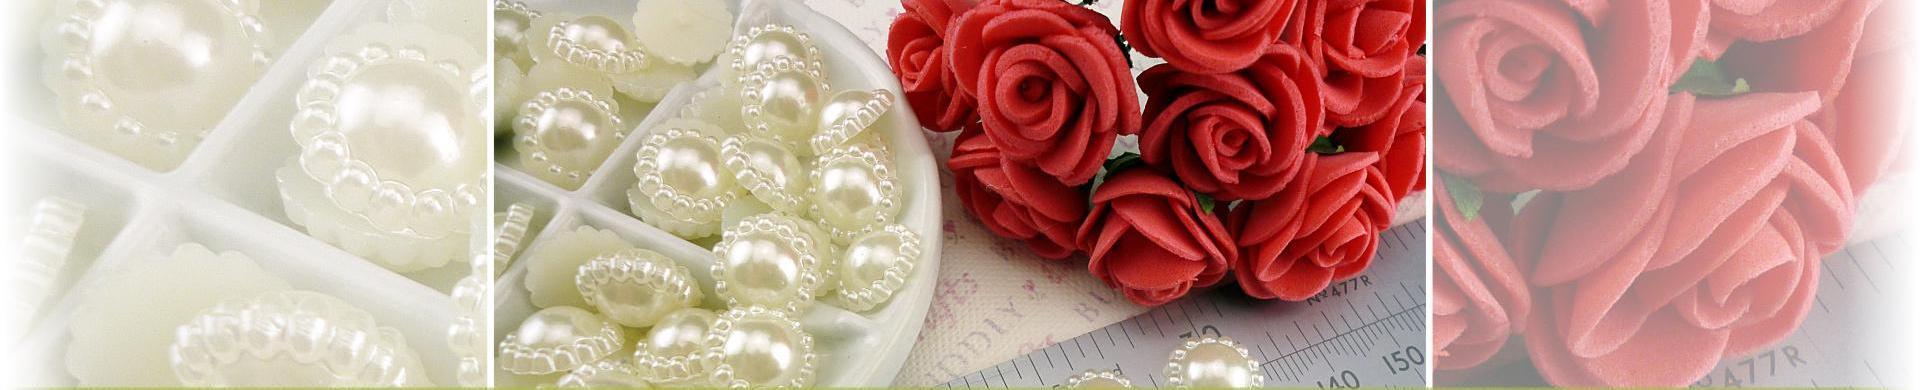 Embellishments, Ribbons & Lace